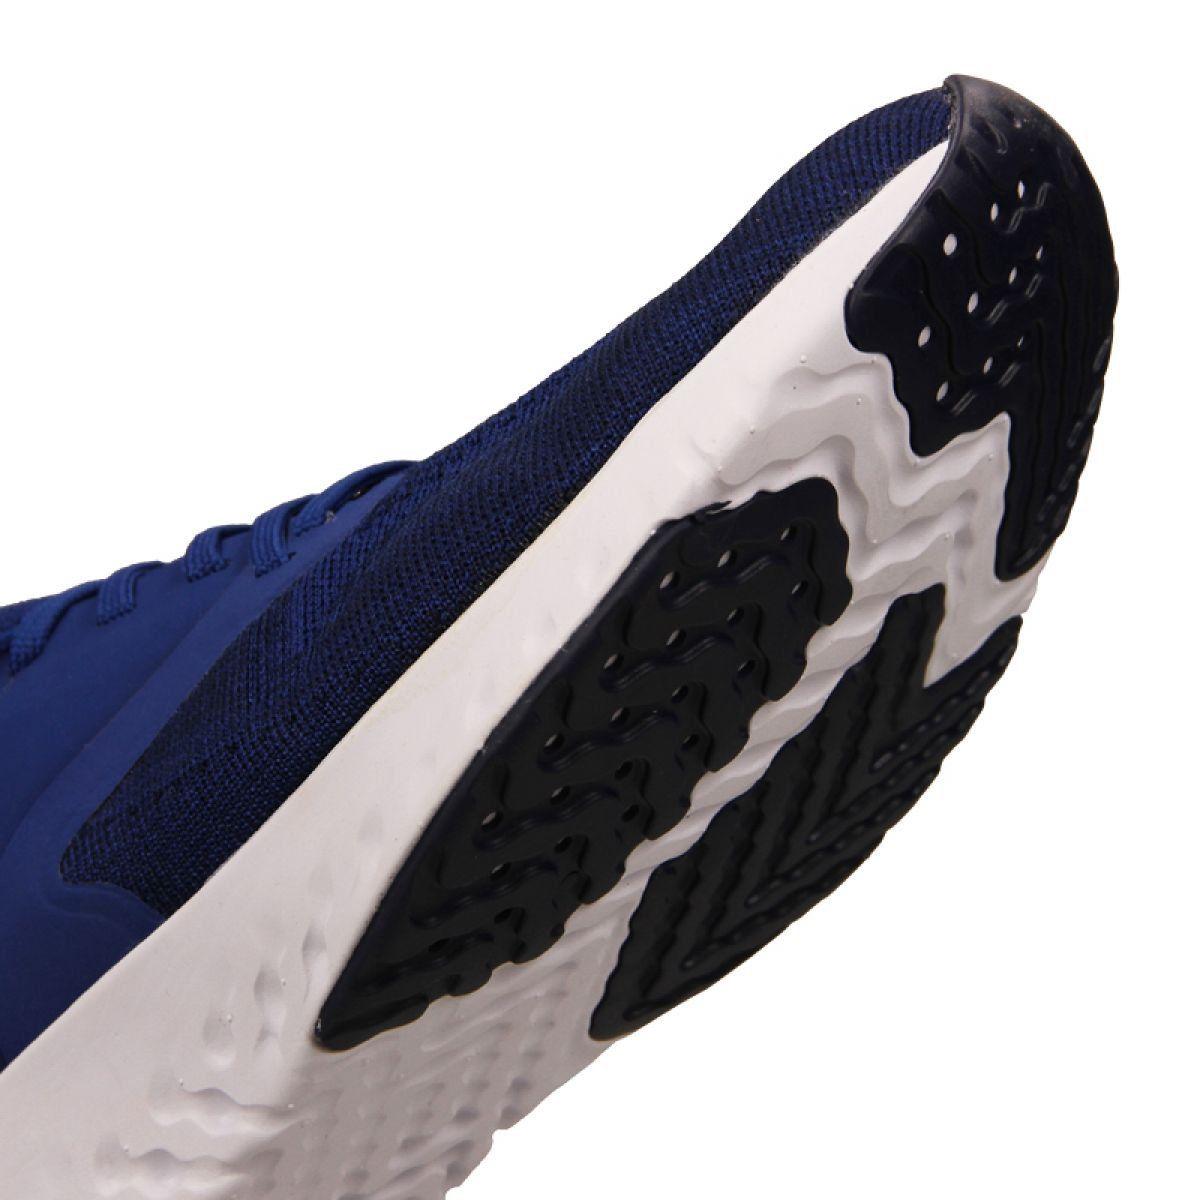 Training Running Sport Nike Nike Odyssey React 2 Flyknit M Ah1015 400 Shoes Blue Blue Shoes Nike Running Shoes